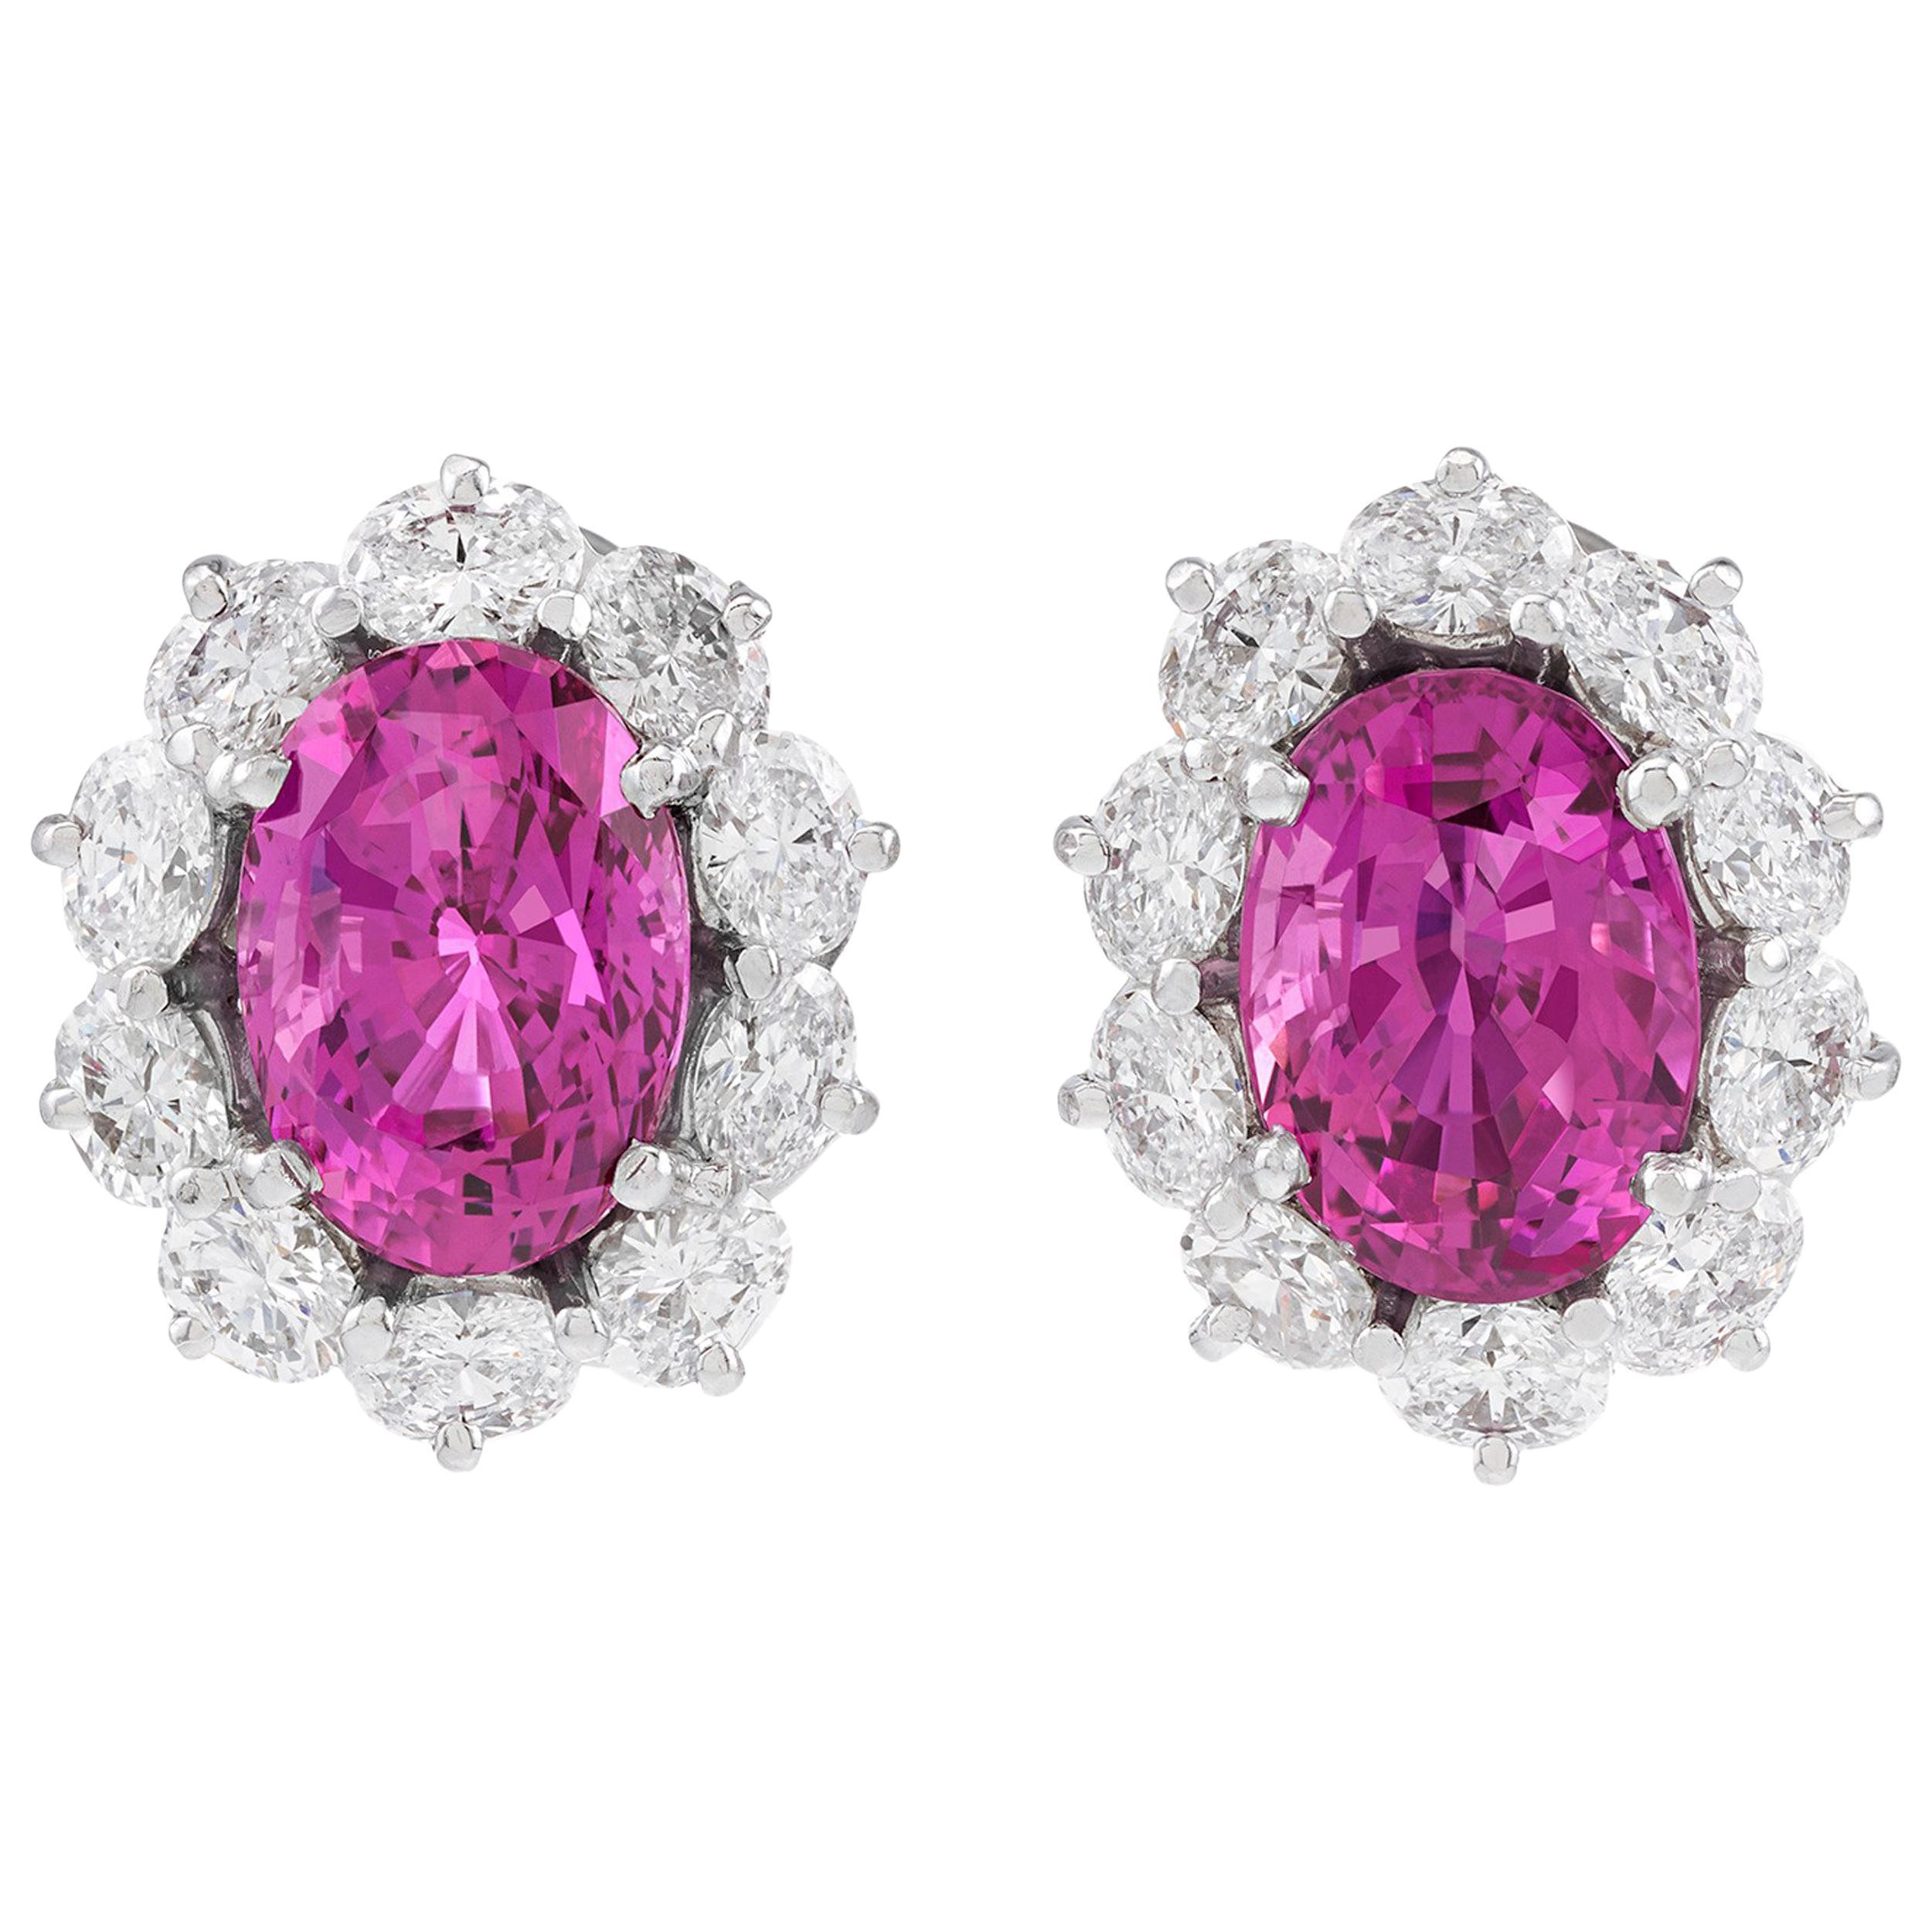 Pink Ceylon Sapphire and Diamond Earrings